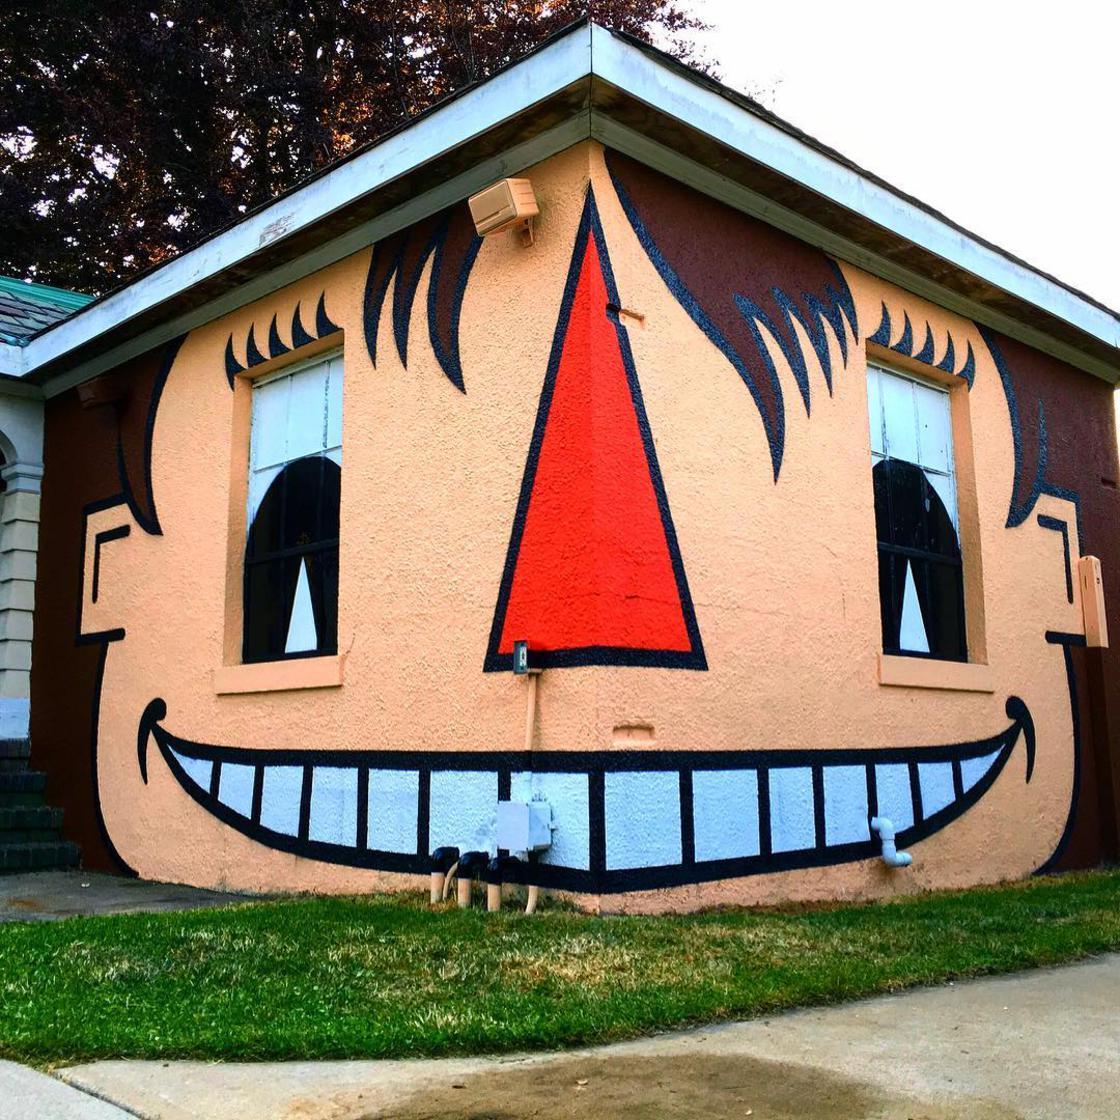 tom-bob-street-art-new-york-9.jpg